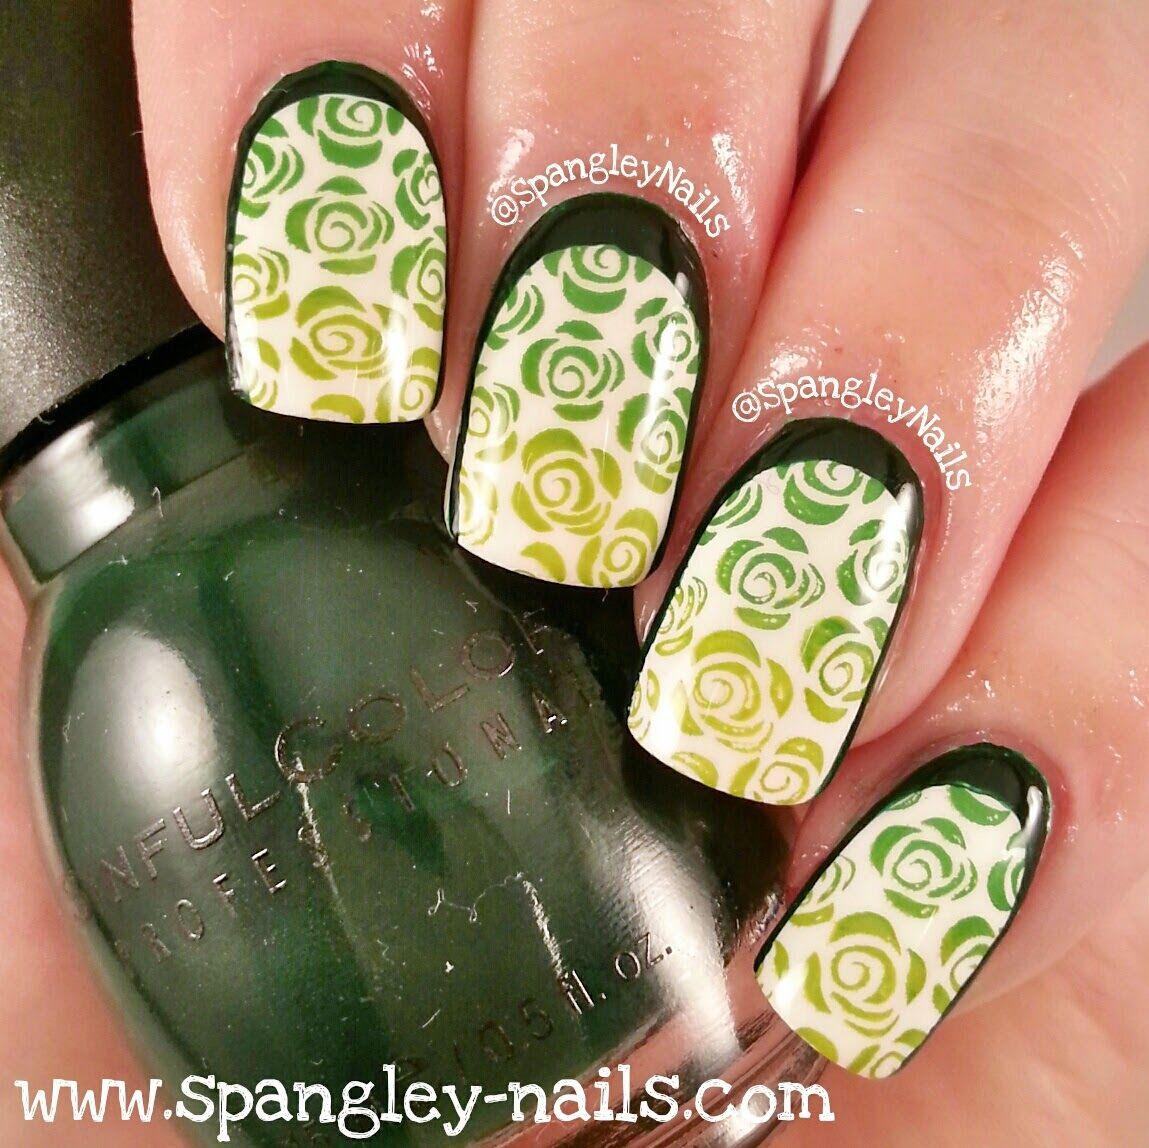 Spangley Nails | UK Nail Art Blog: #FightForLightAndLive Depression ...